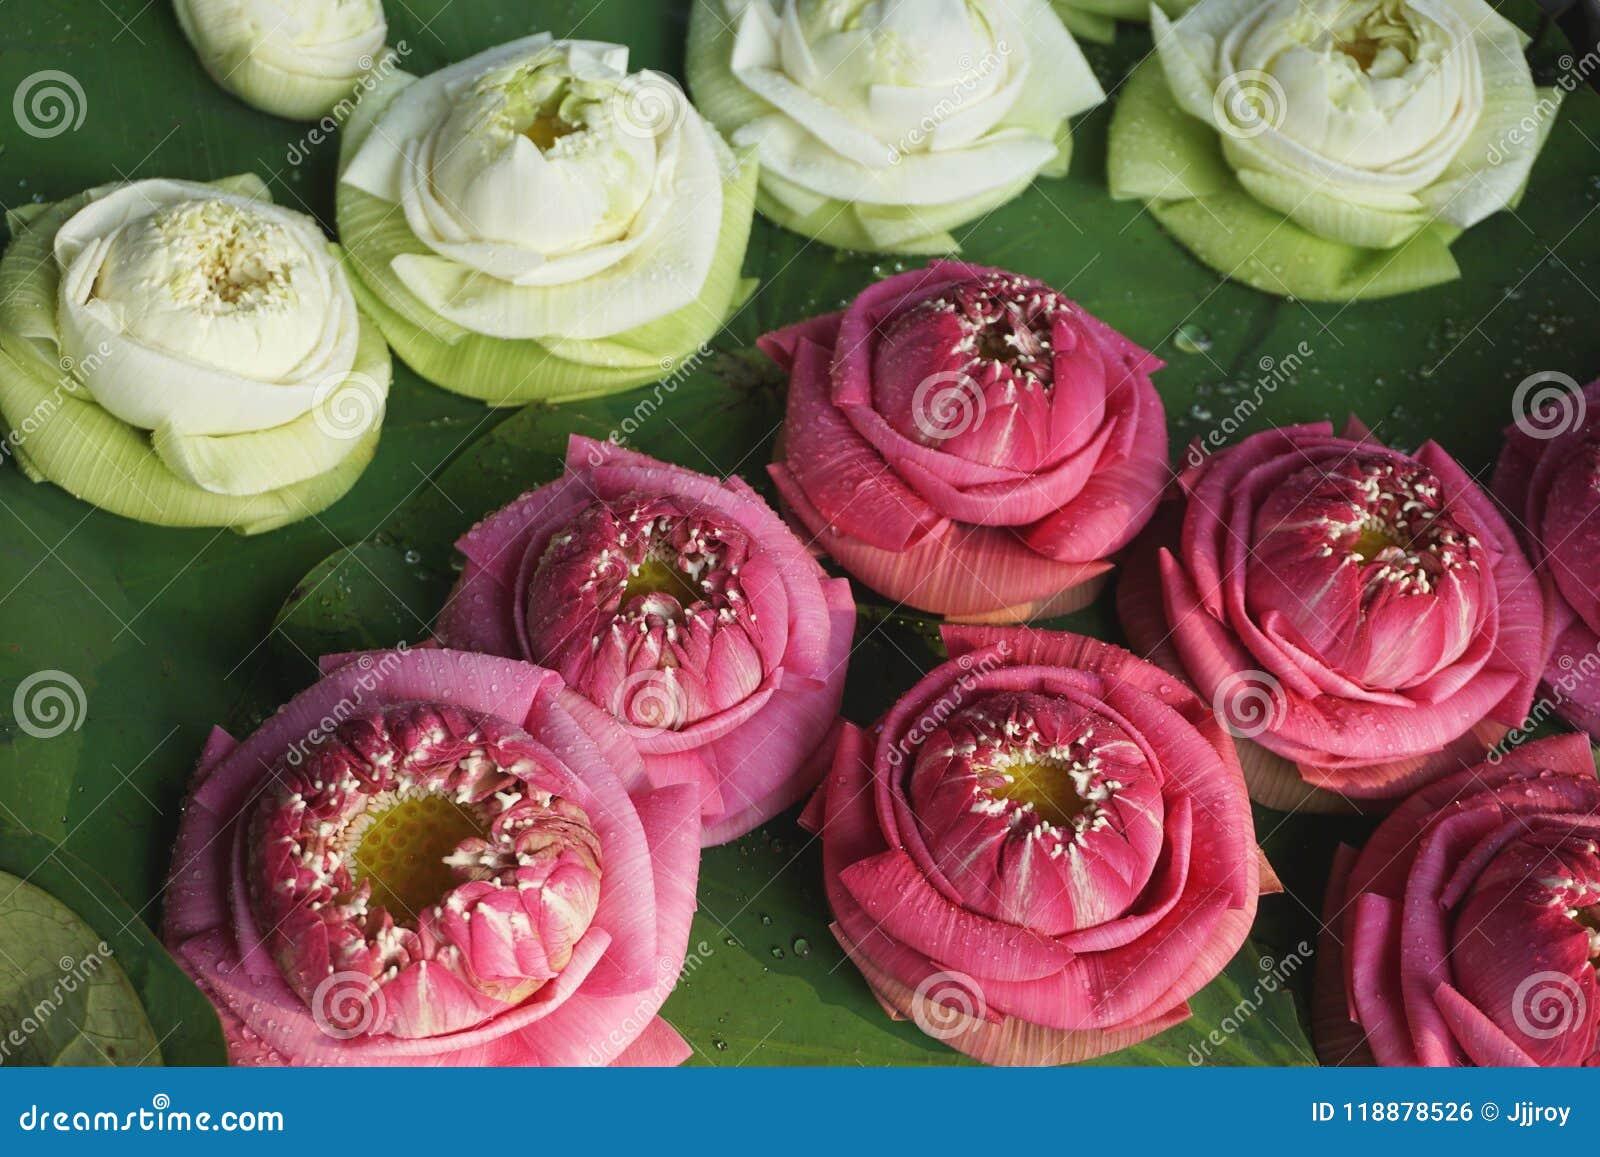 Colorful Lotus Flower Offerings At A Hindu Temple In Bangkok